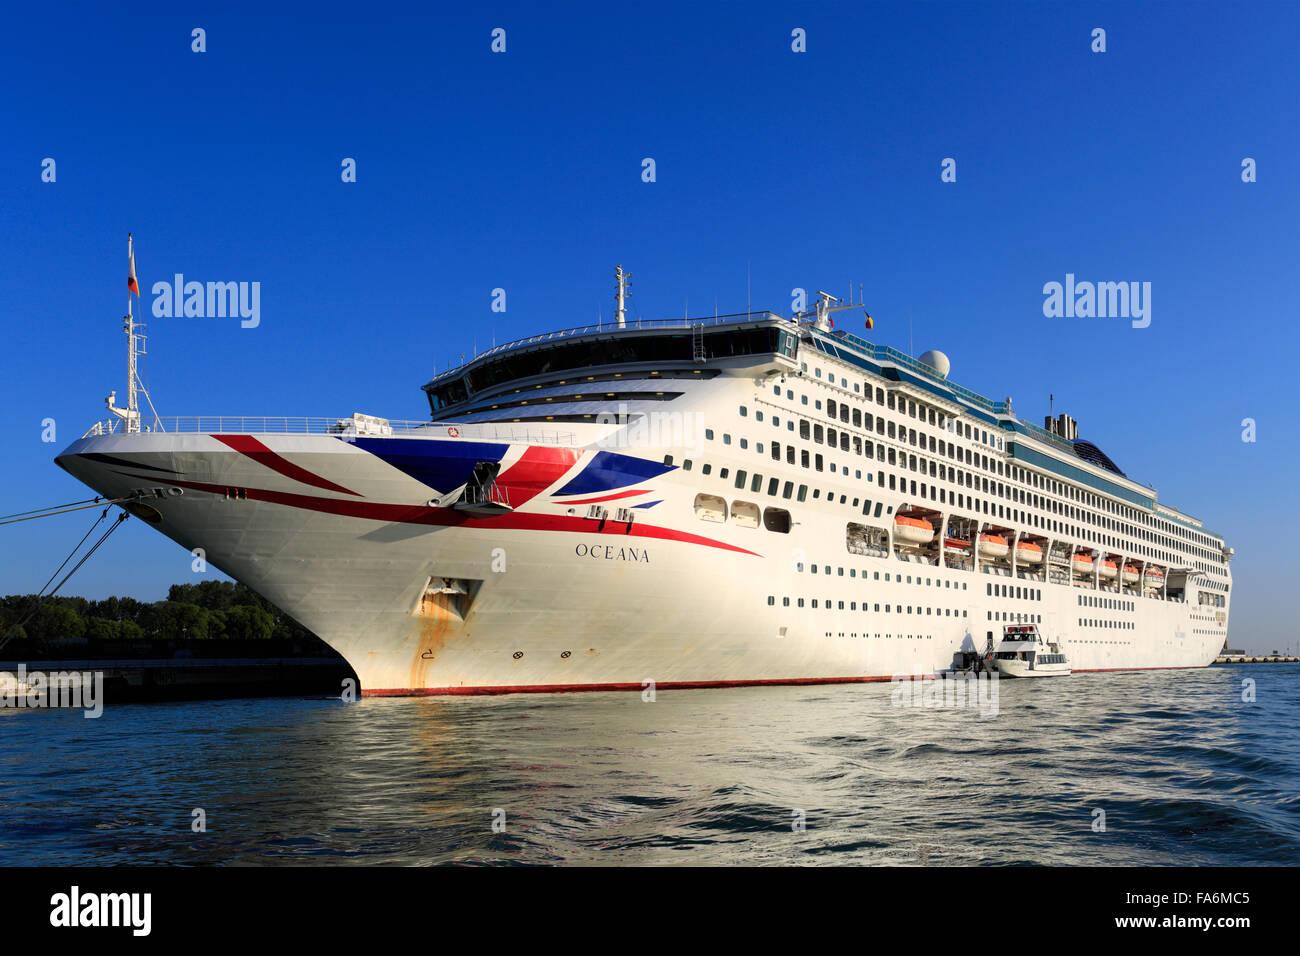 P And O Cruise Ship Oceana Cruising Into The Grand Terminal - Oceana cruise lines